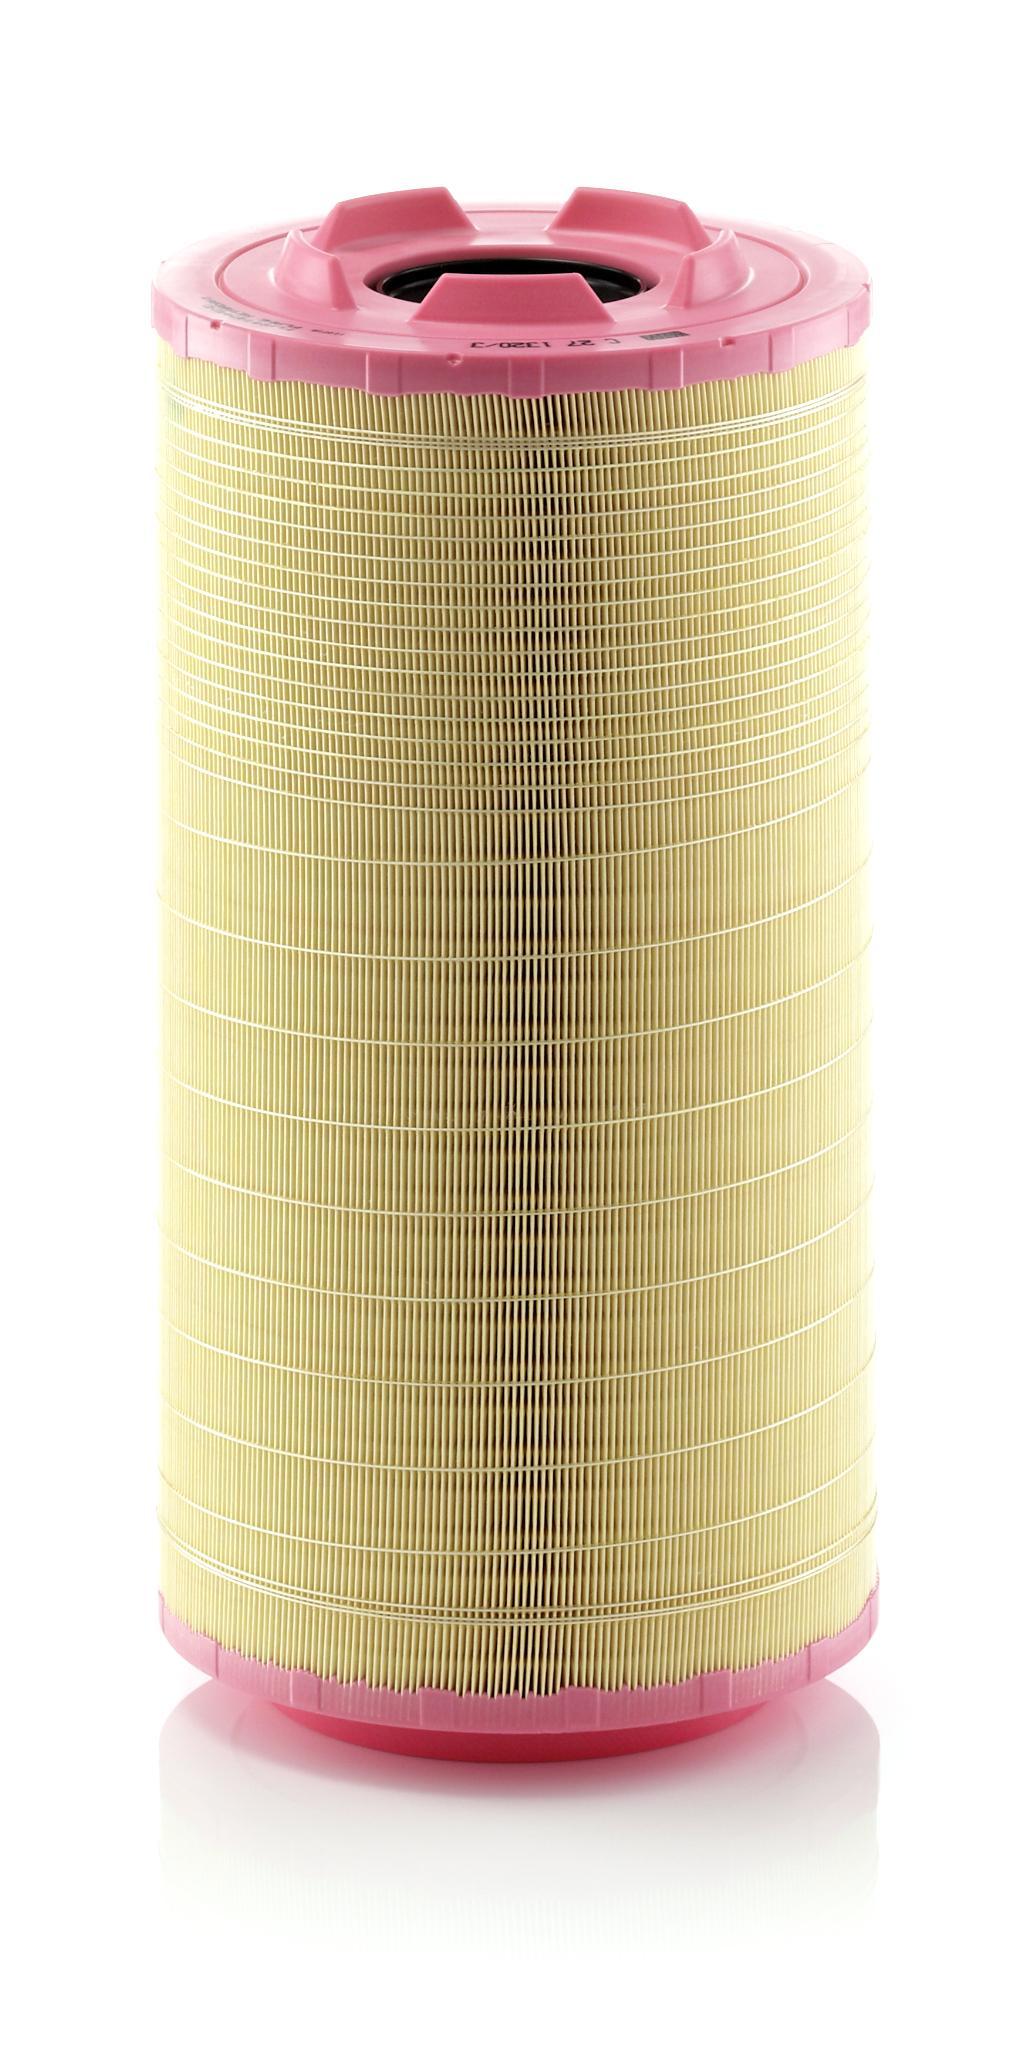 MANN-FILTER Filtr powietrza do MERCEDES-BENZ - numer produktu: C 27 1320/3